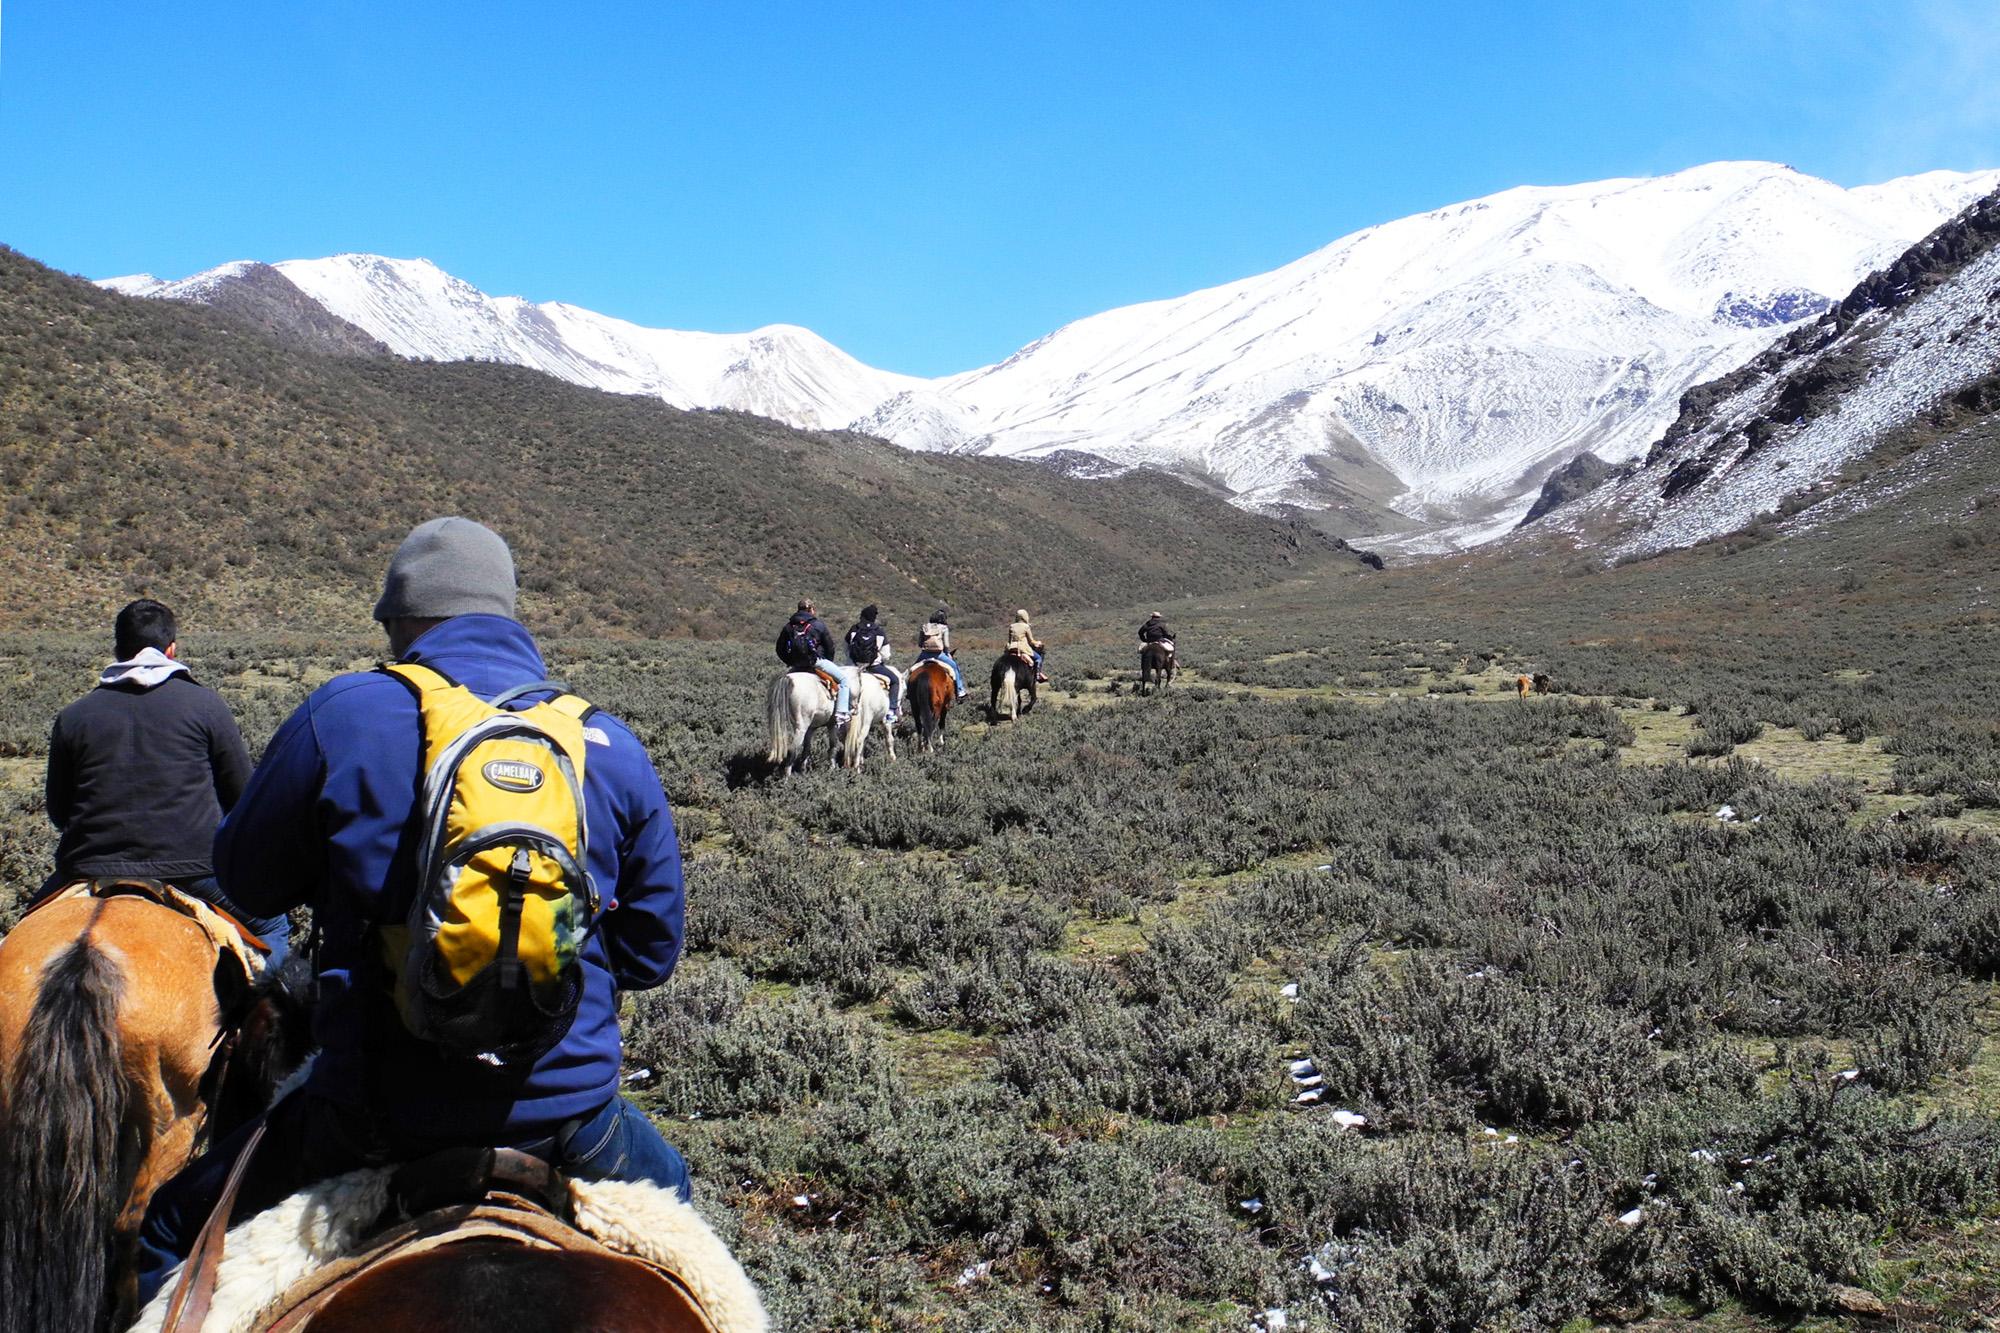 wine-TROTTERS_oenotourisme_wine-tourism-agency_tour_vino_vin_turismo_ARGENTINA_Mendoza_trekking_hiking_horseback-riding_alta-montana_Andes_87_WEB-2000px.jpg